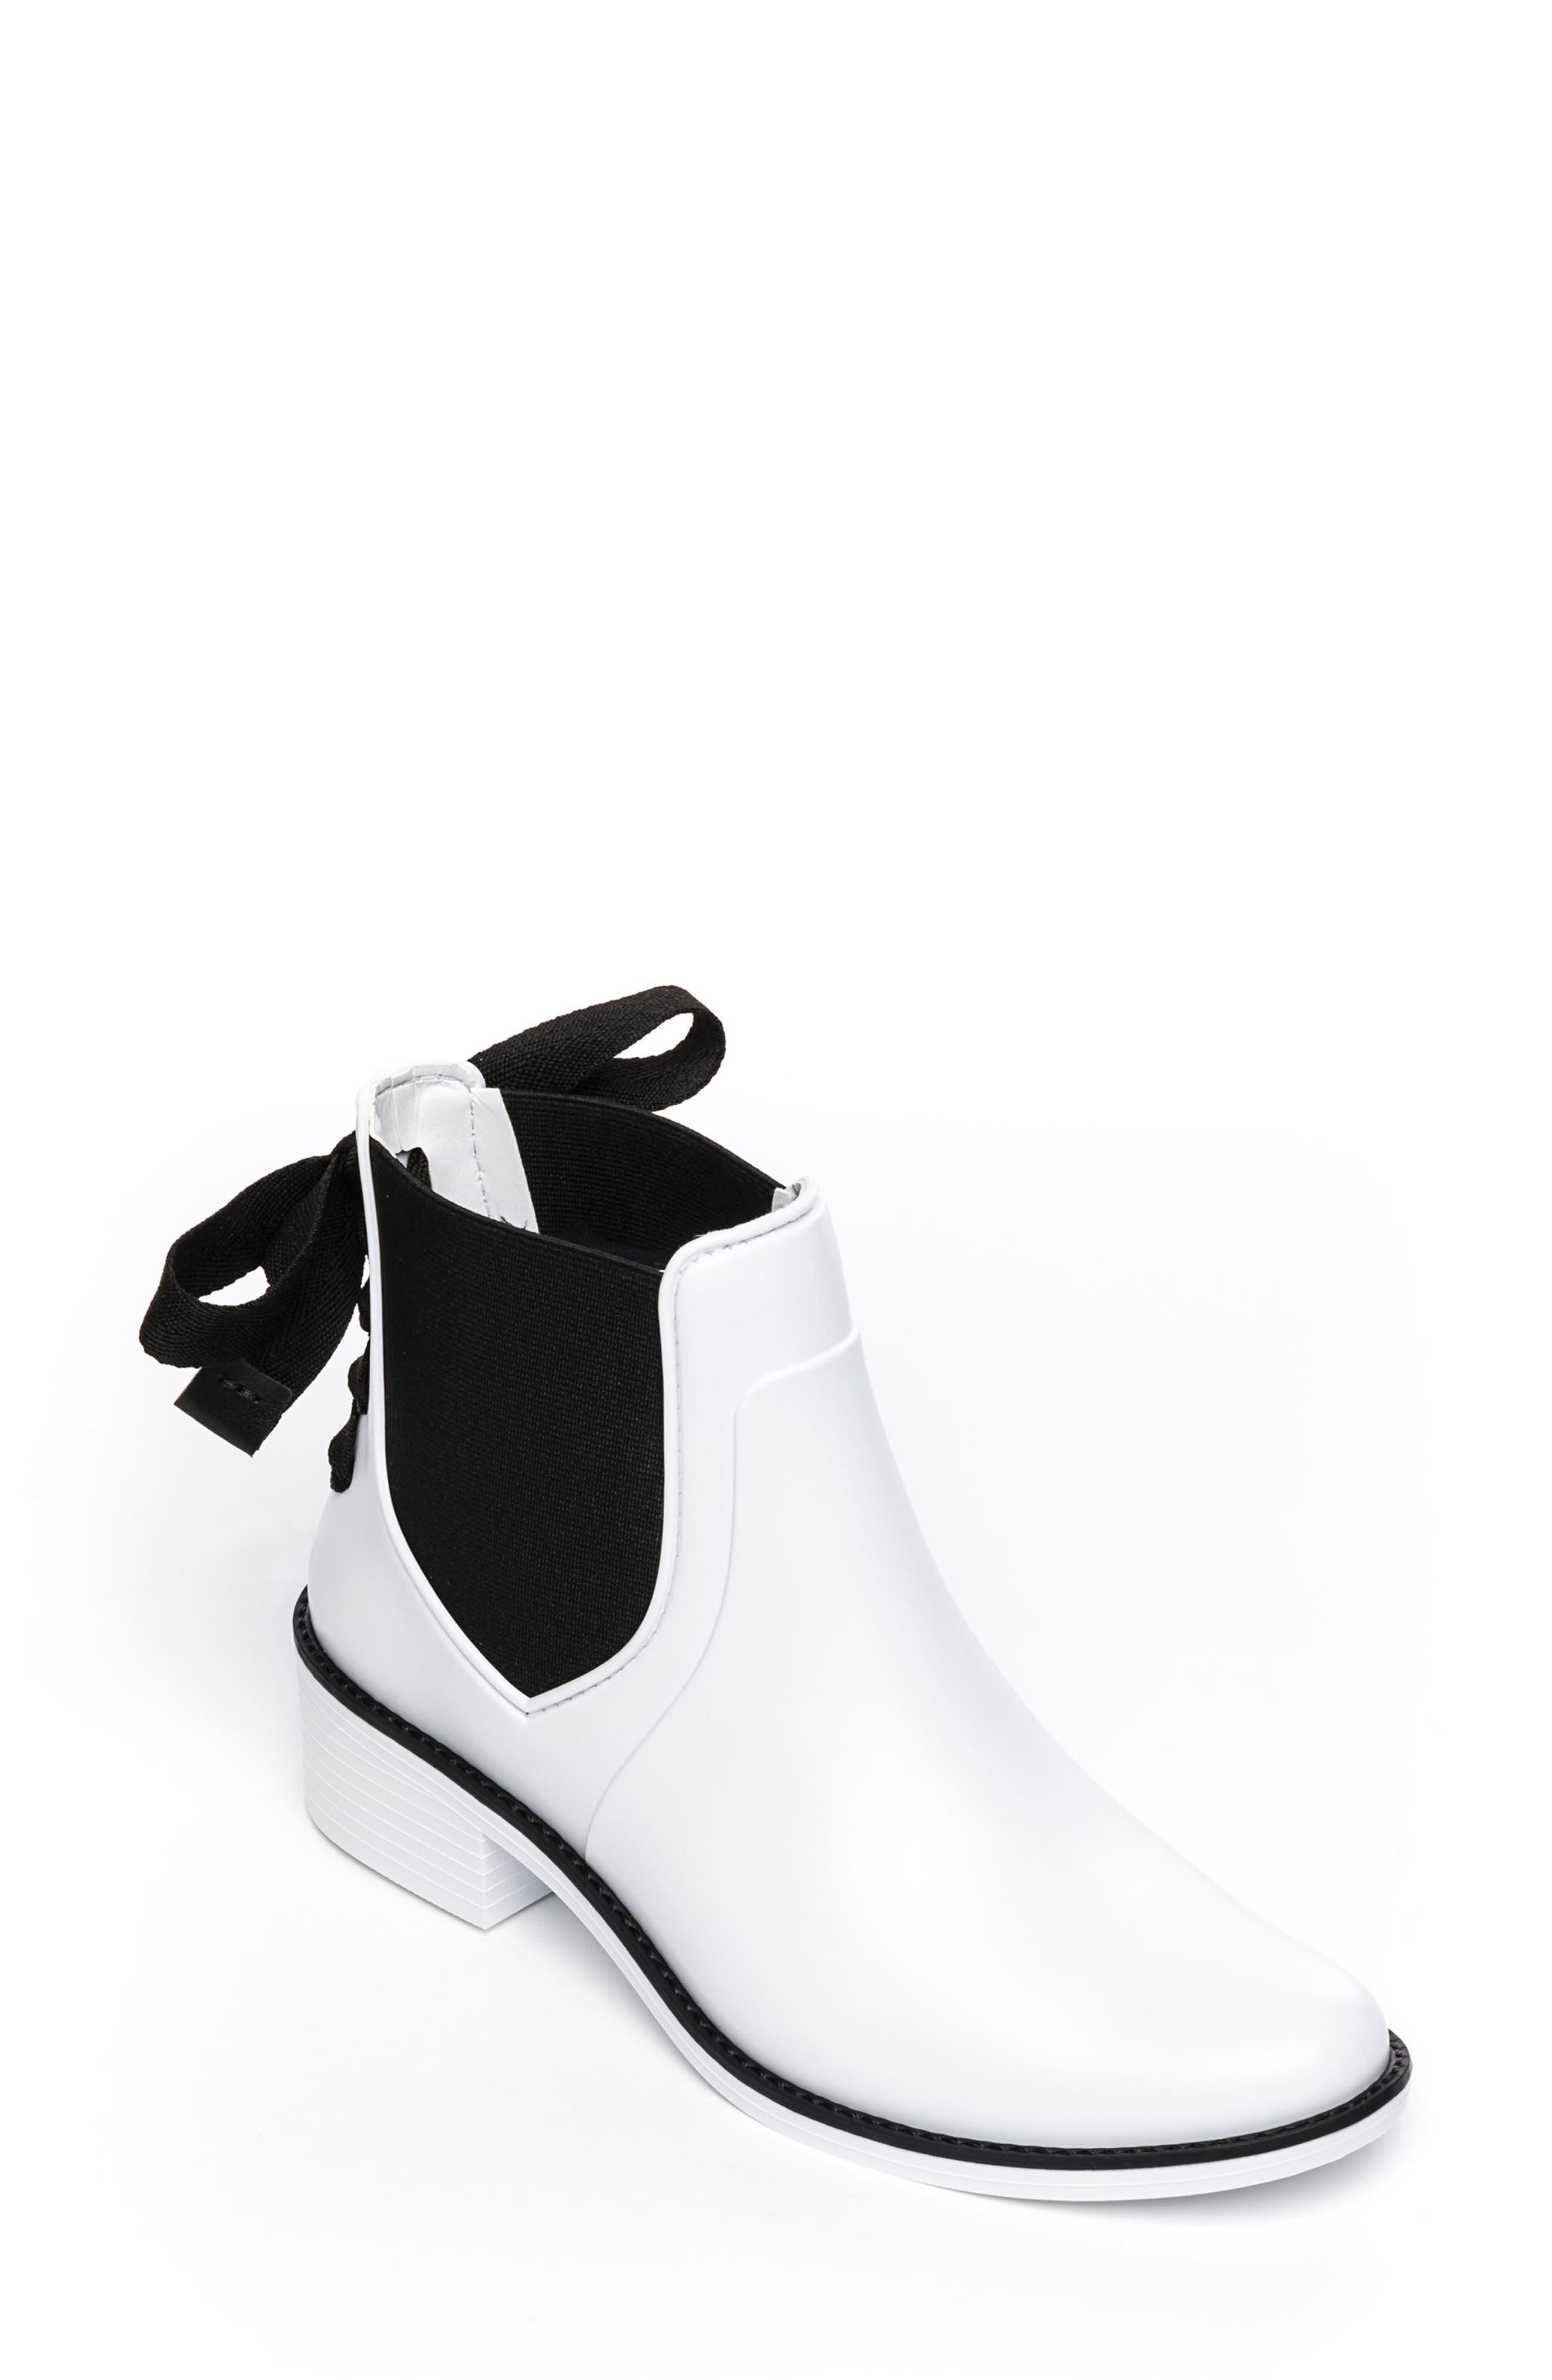 Paige Rain Boot,                         Main,                         color, White